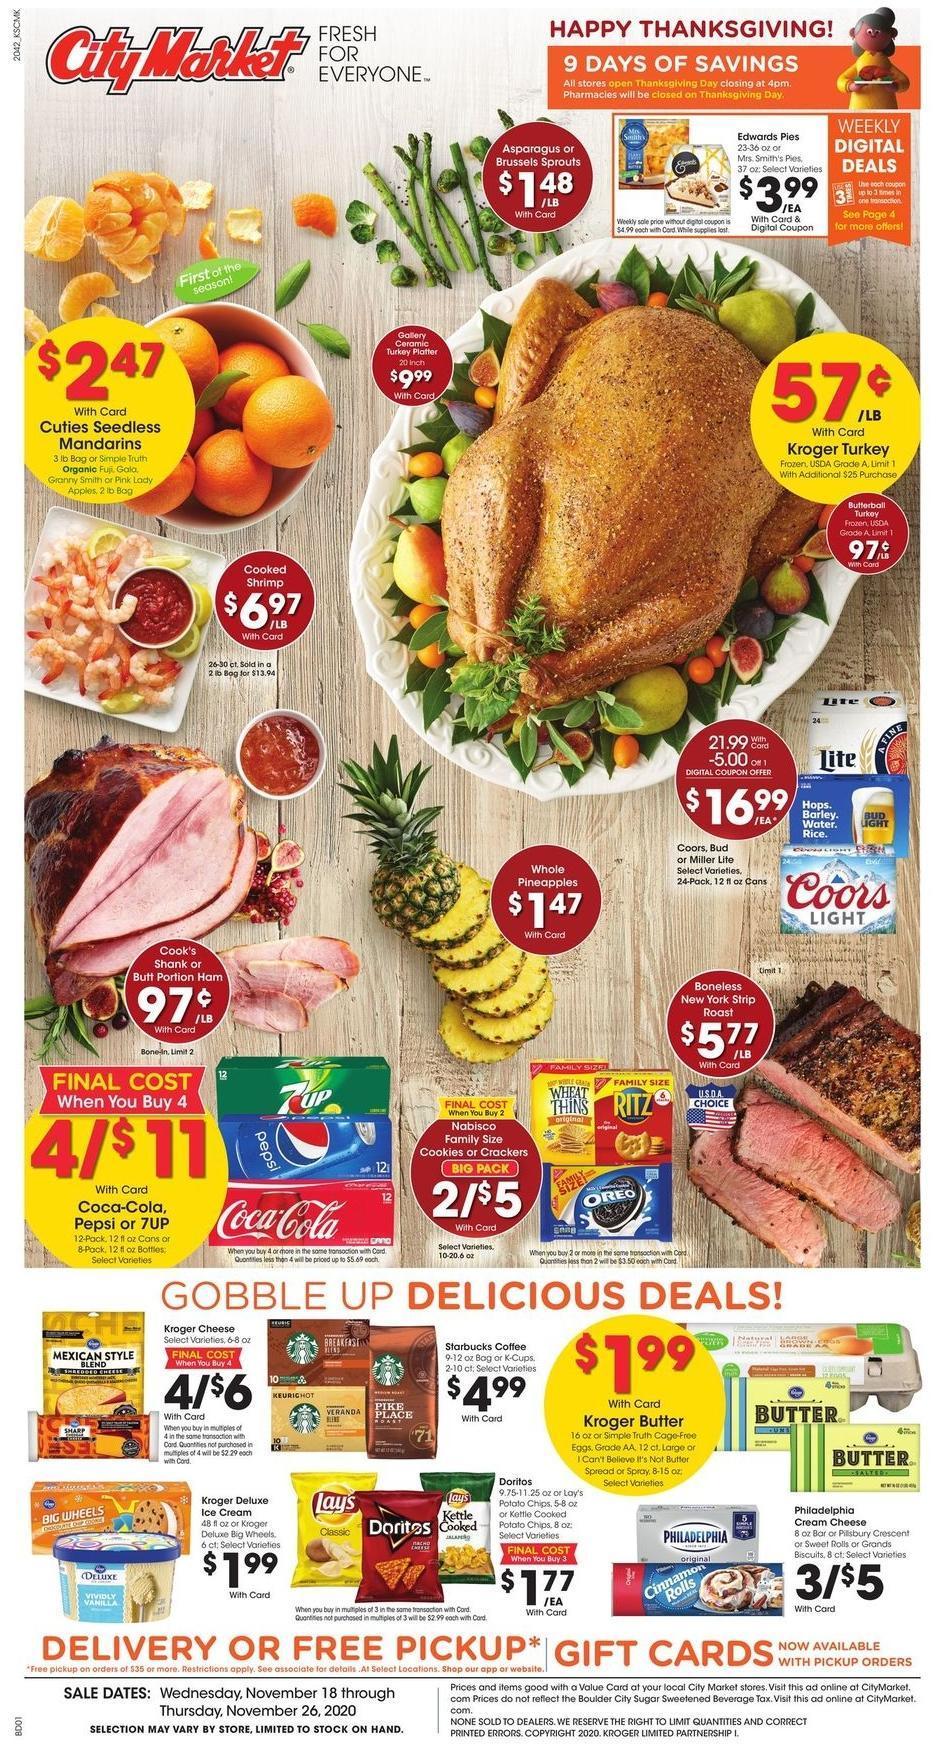 City Market Weekly Ad from November 18